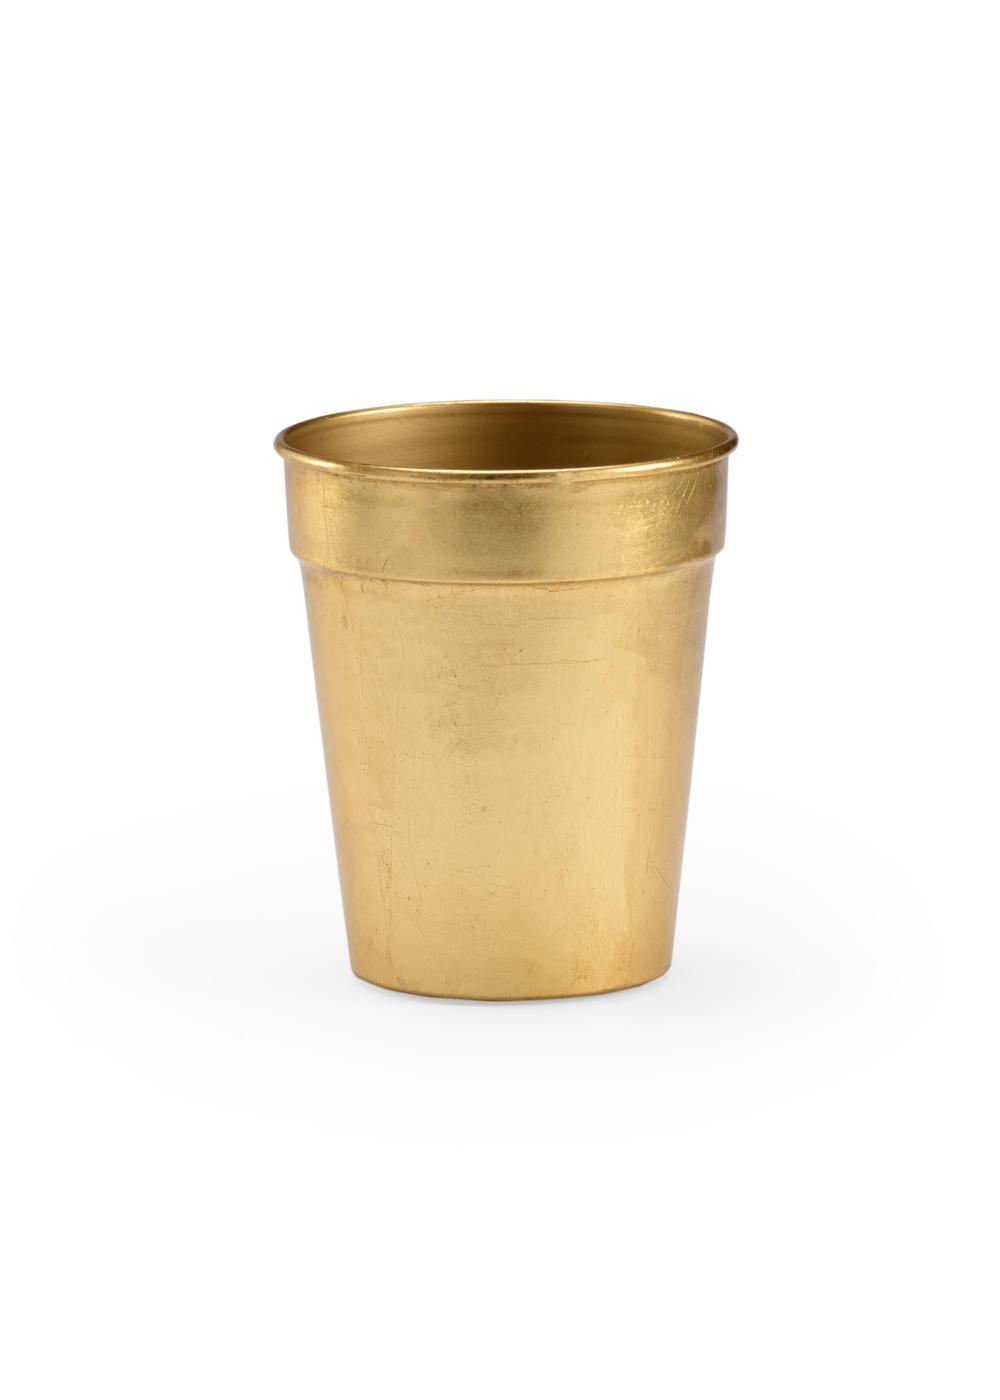 Chelsea House - Gold Leaf Pot